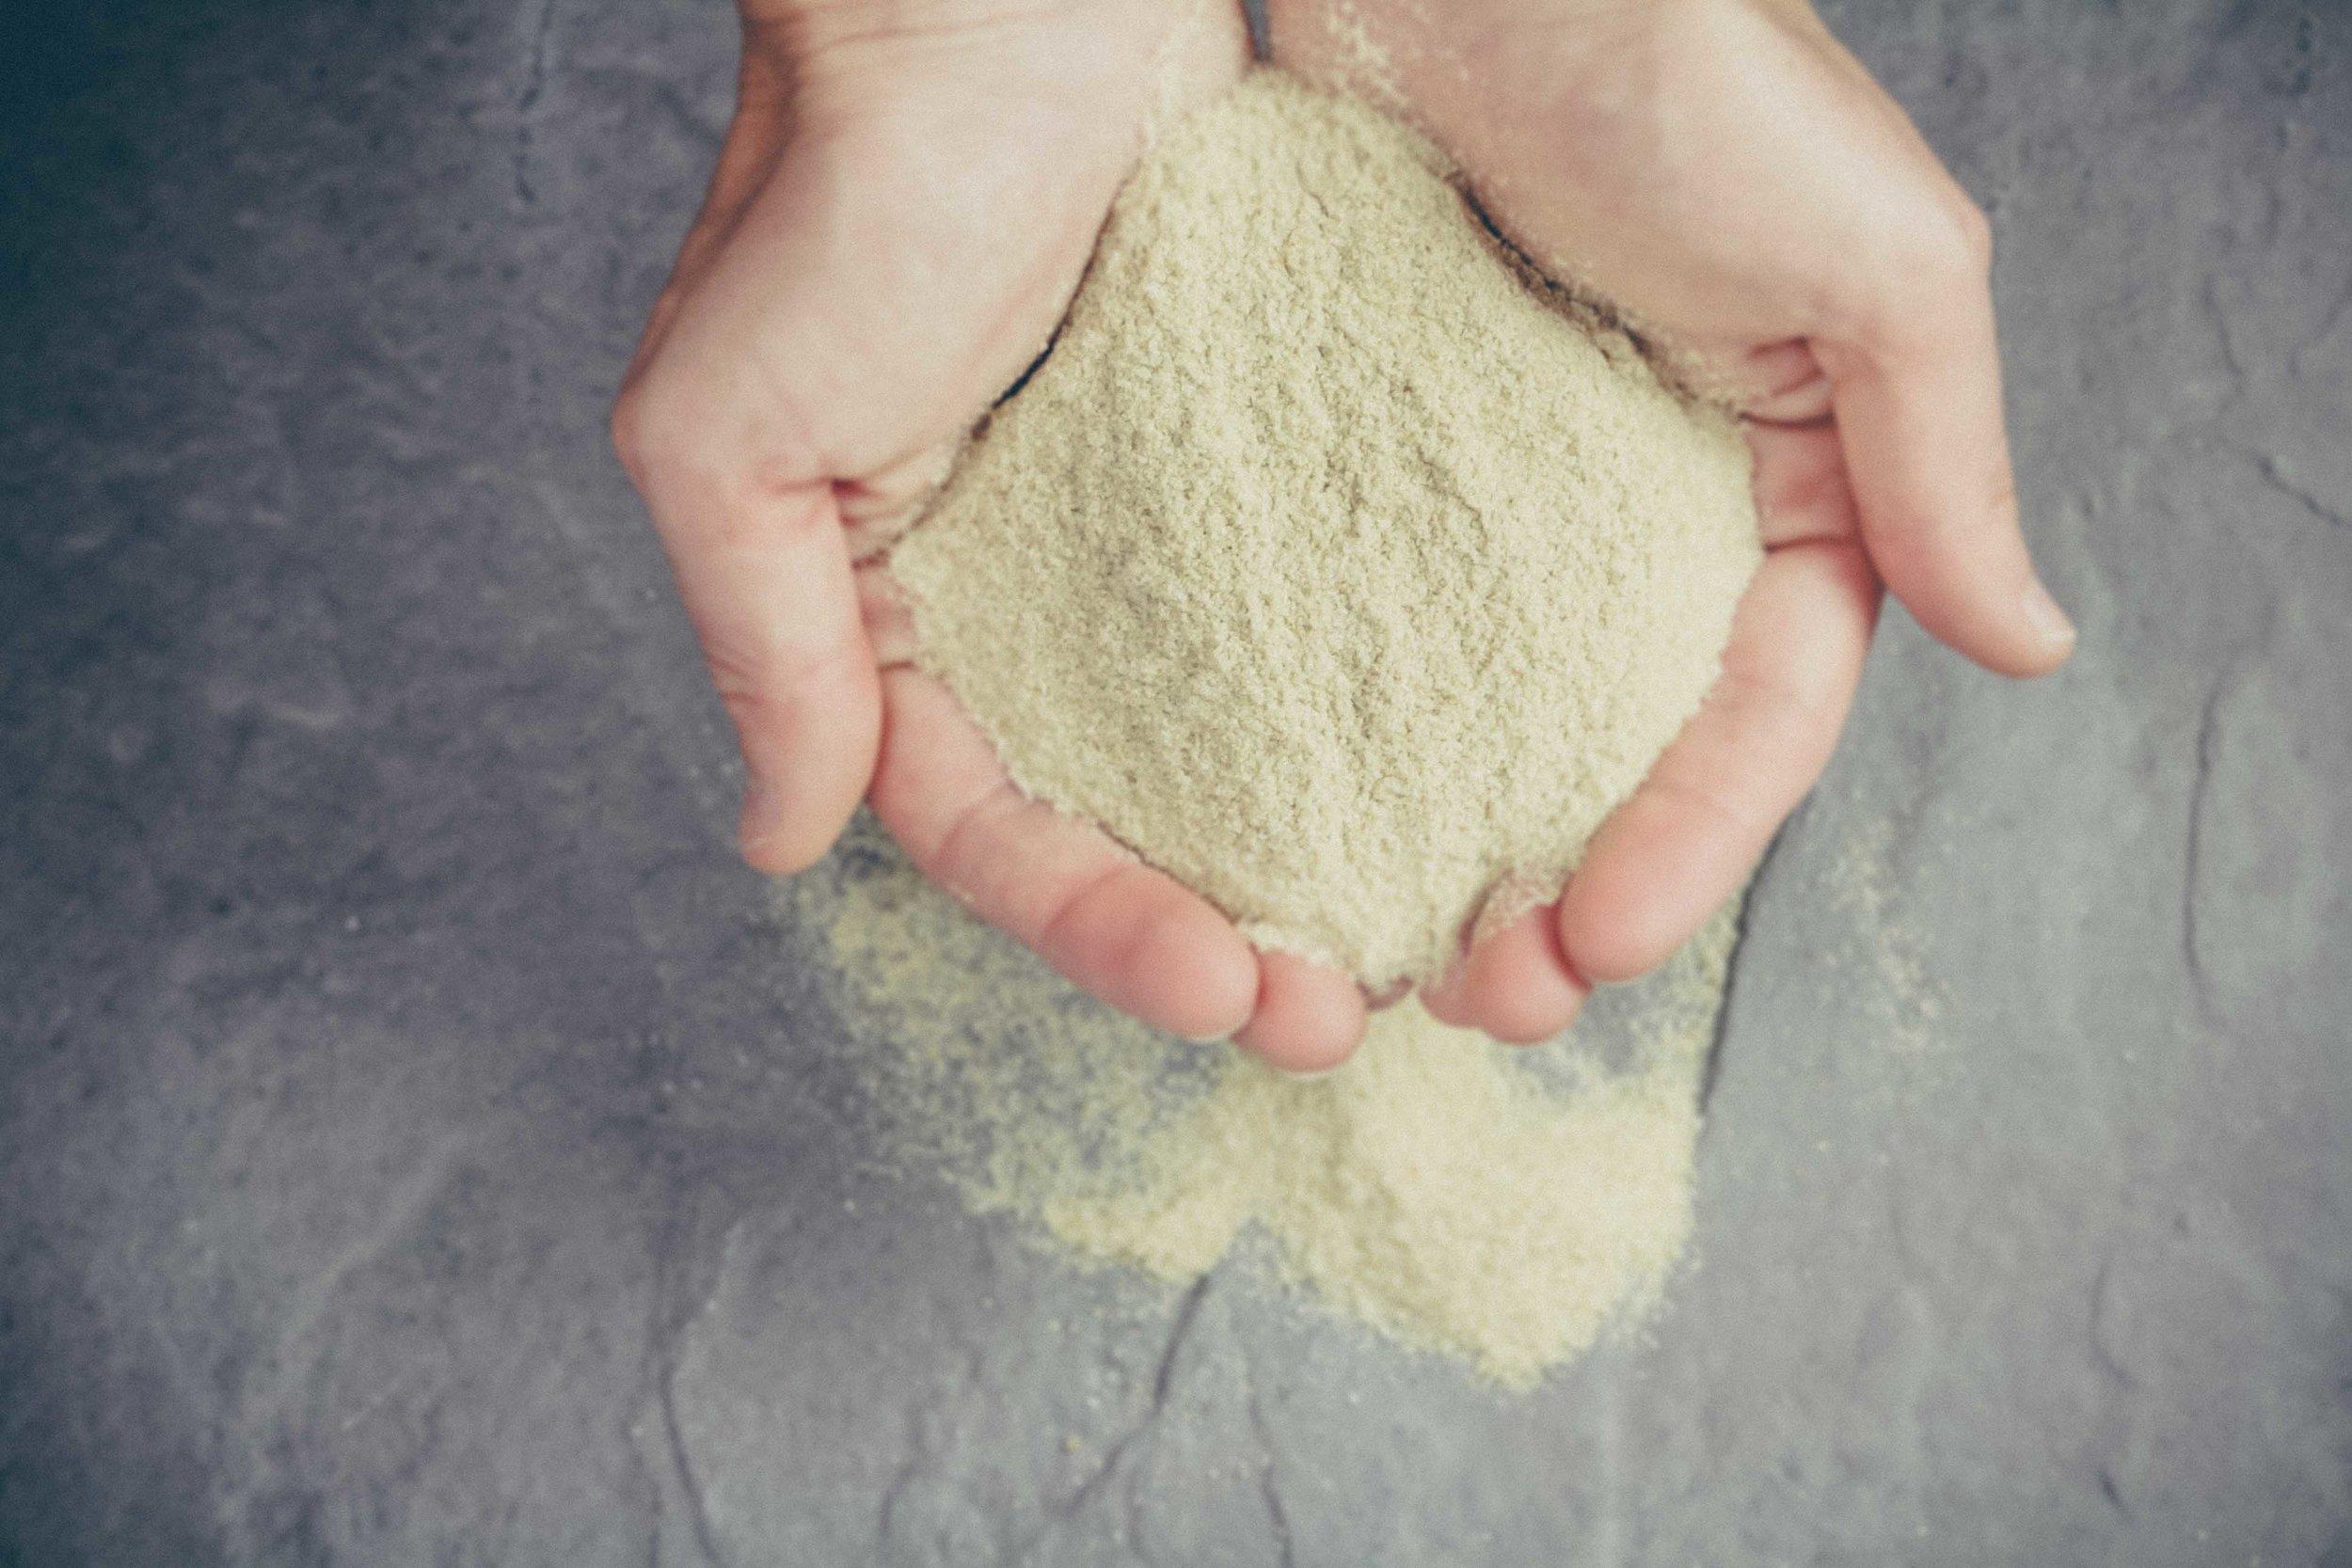 Quinoa Flour Hands